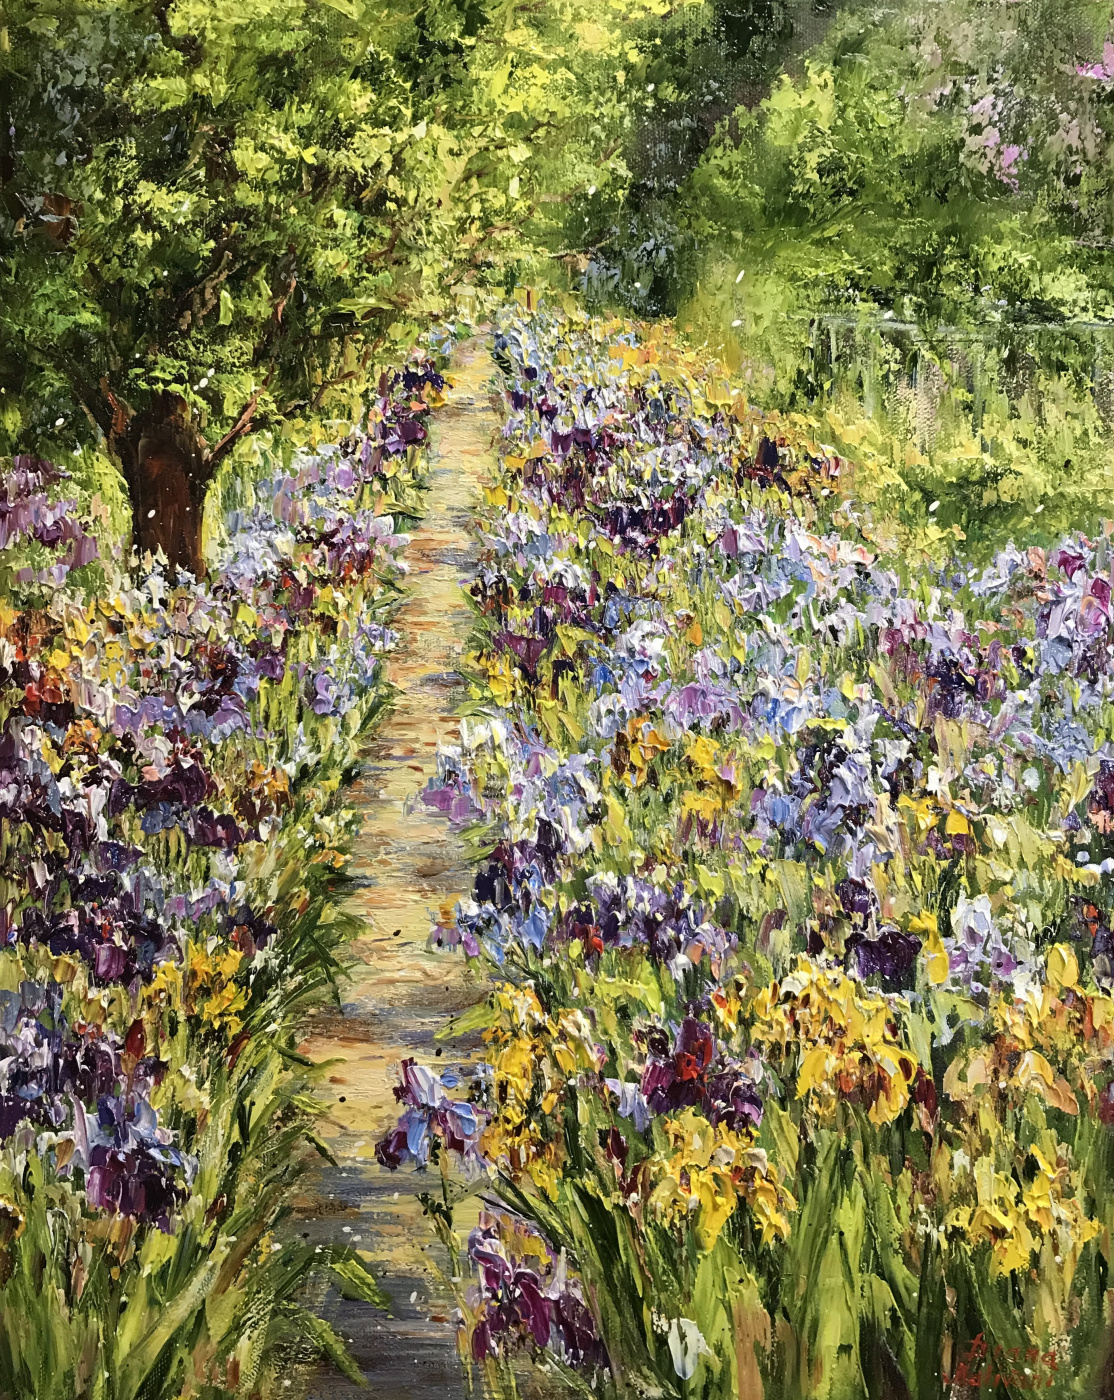 Диана Владимировна Маливани. A Path in the Garden